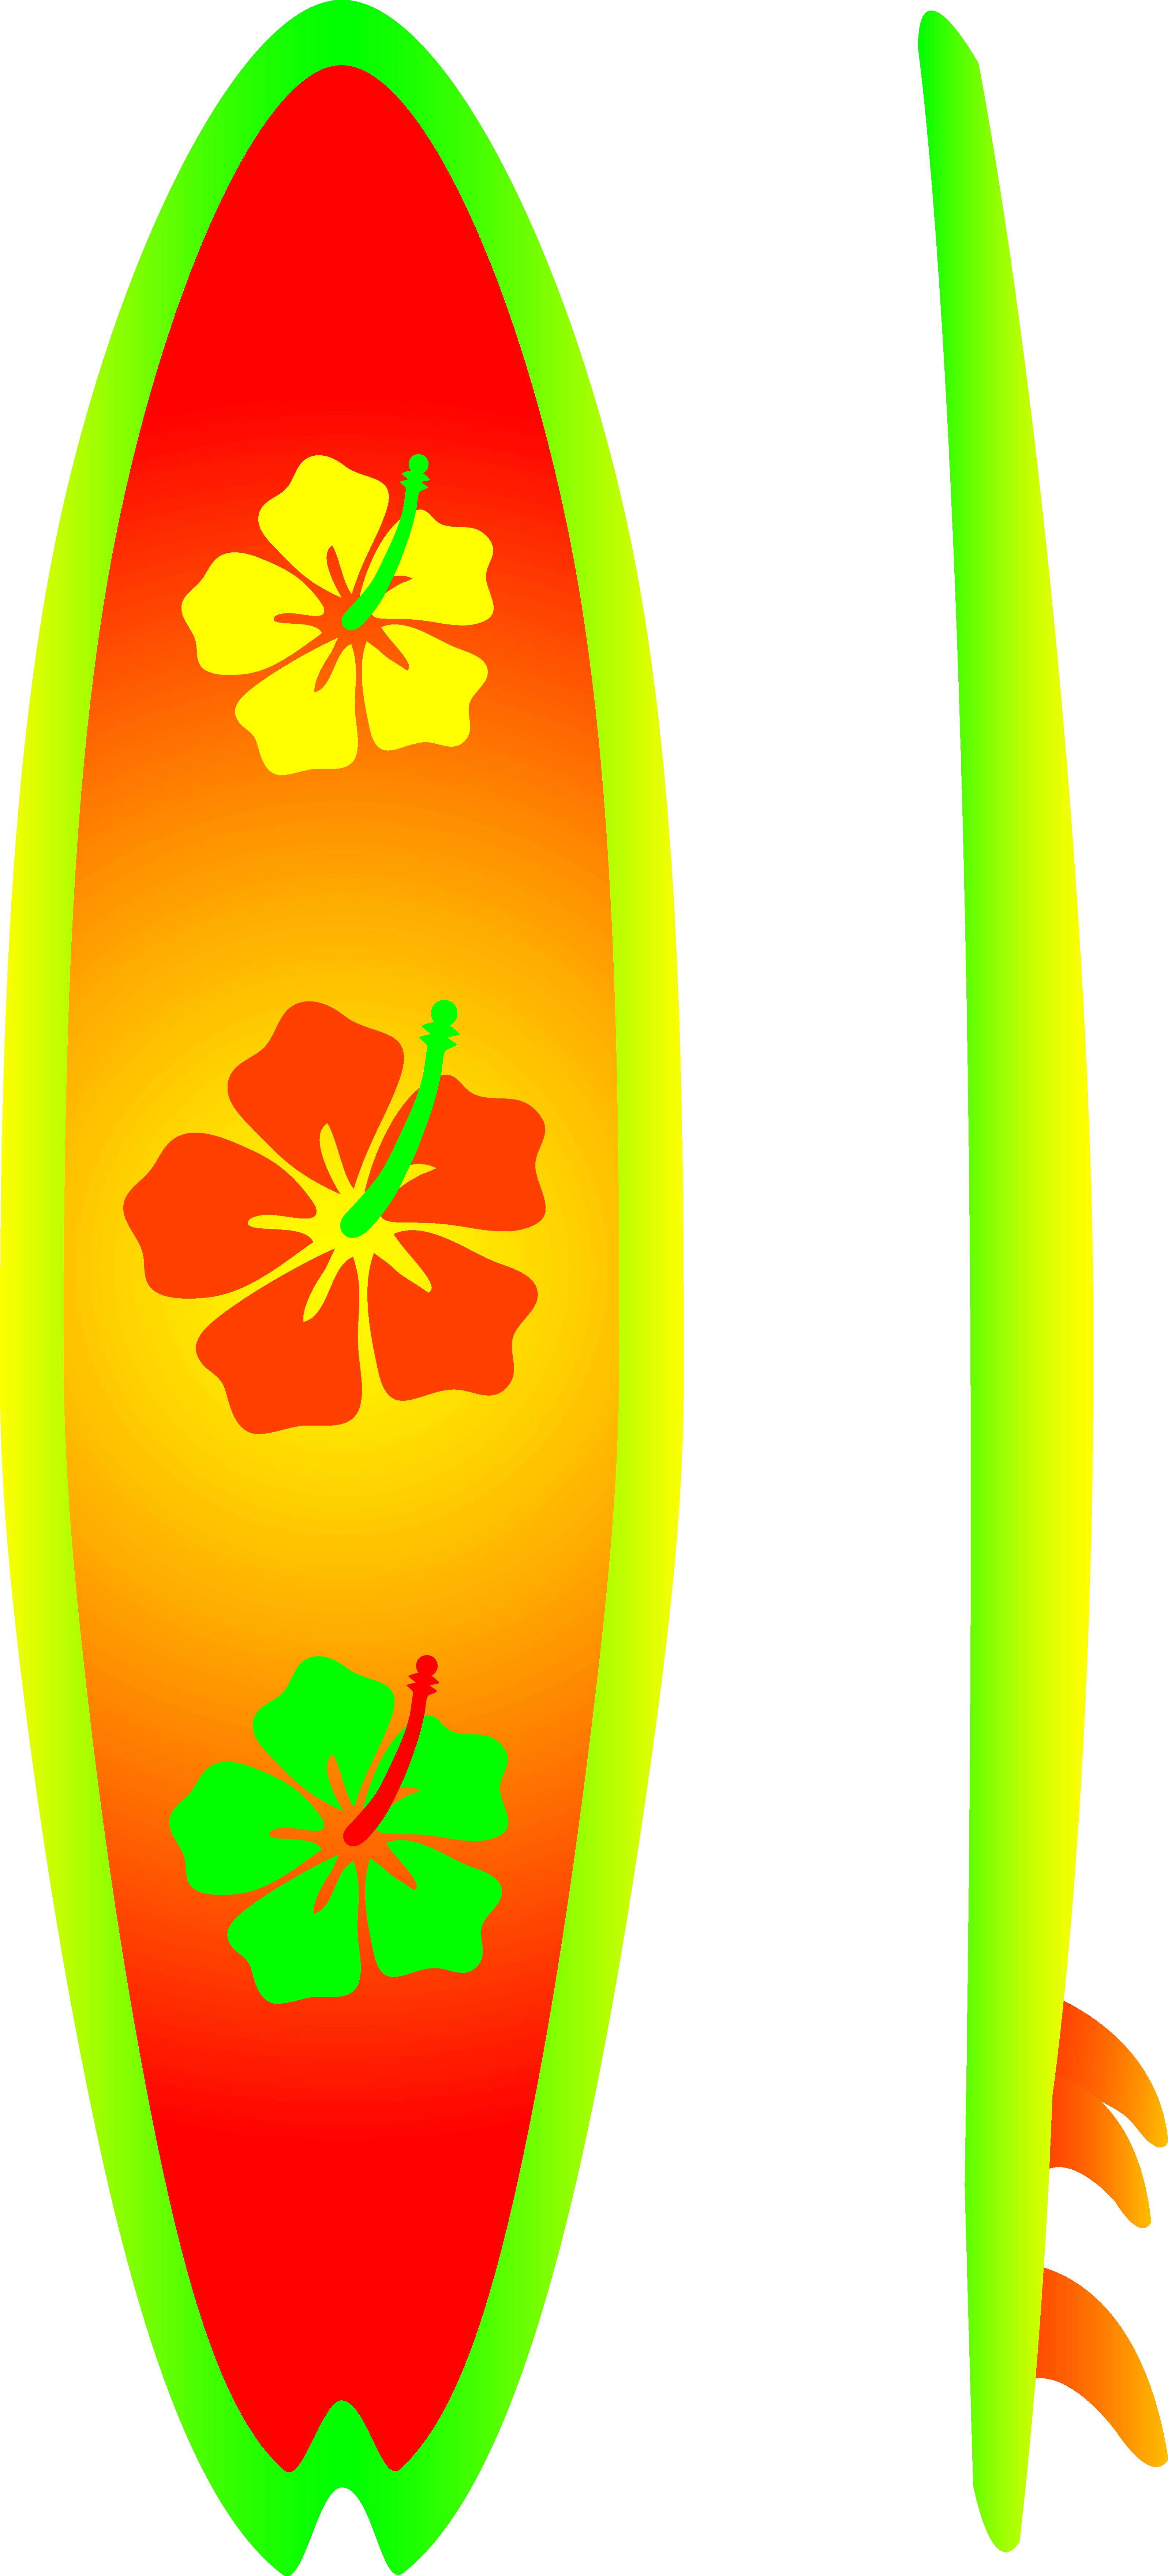 clip art stock Neon Surfboard With Hibiscus Design